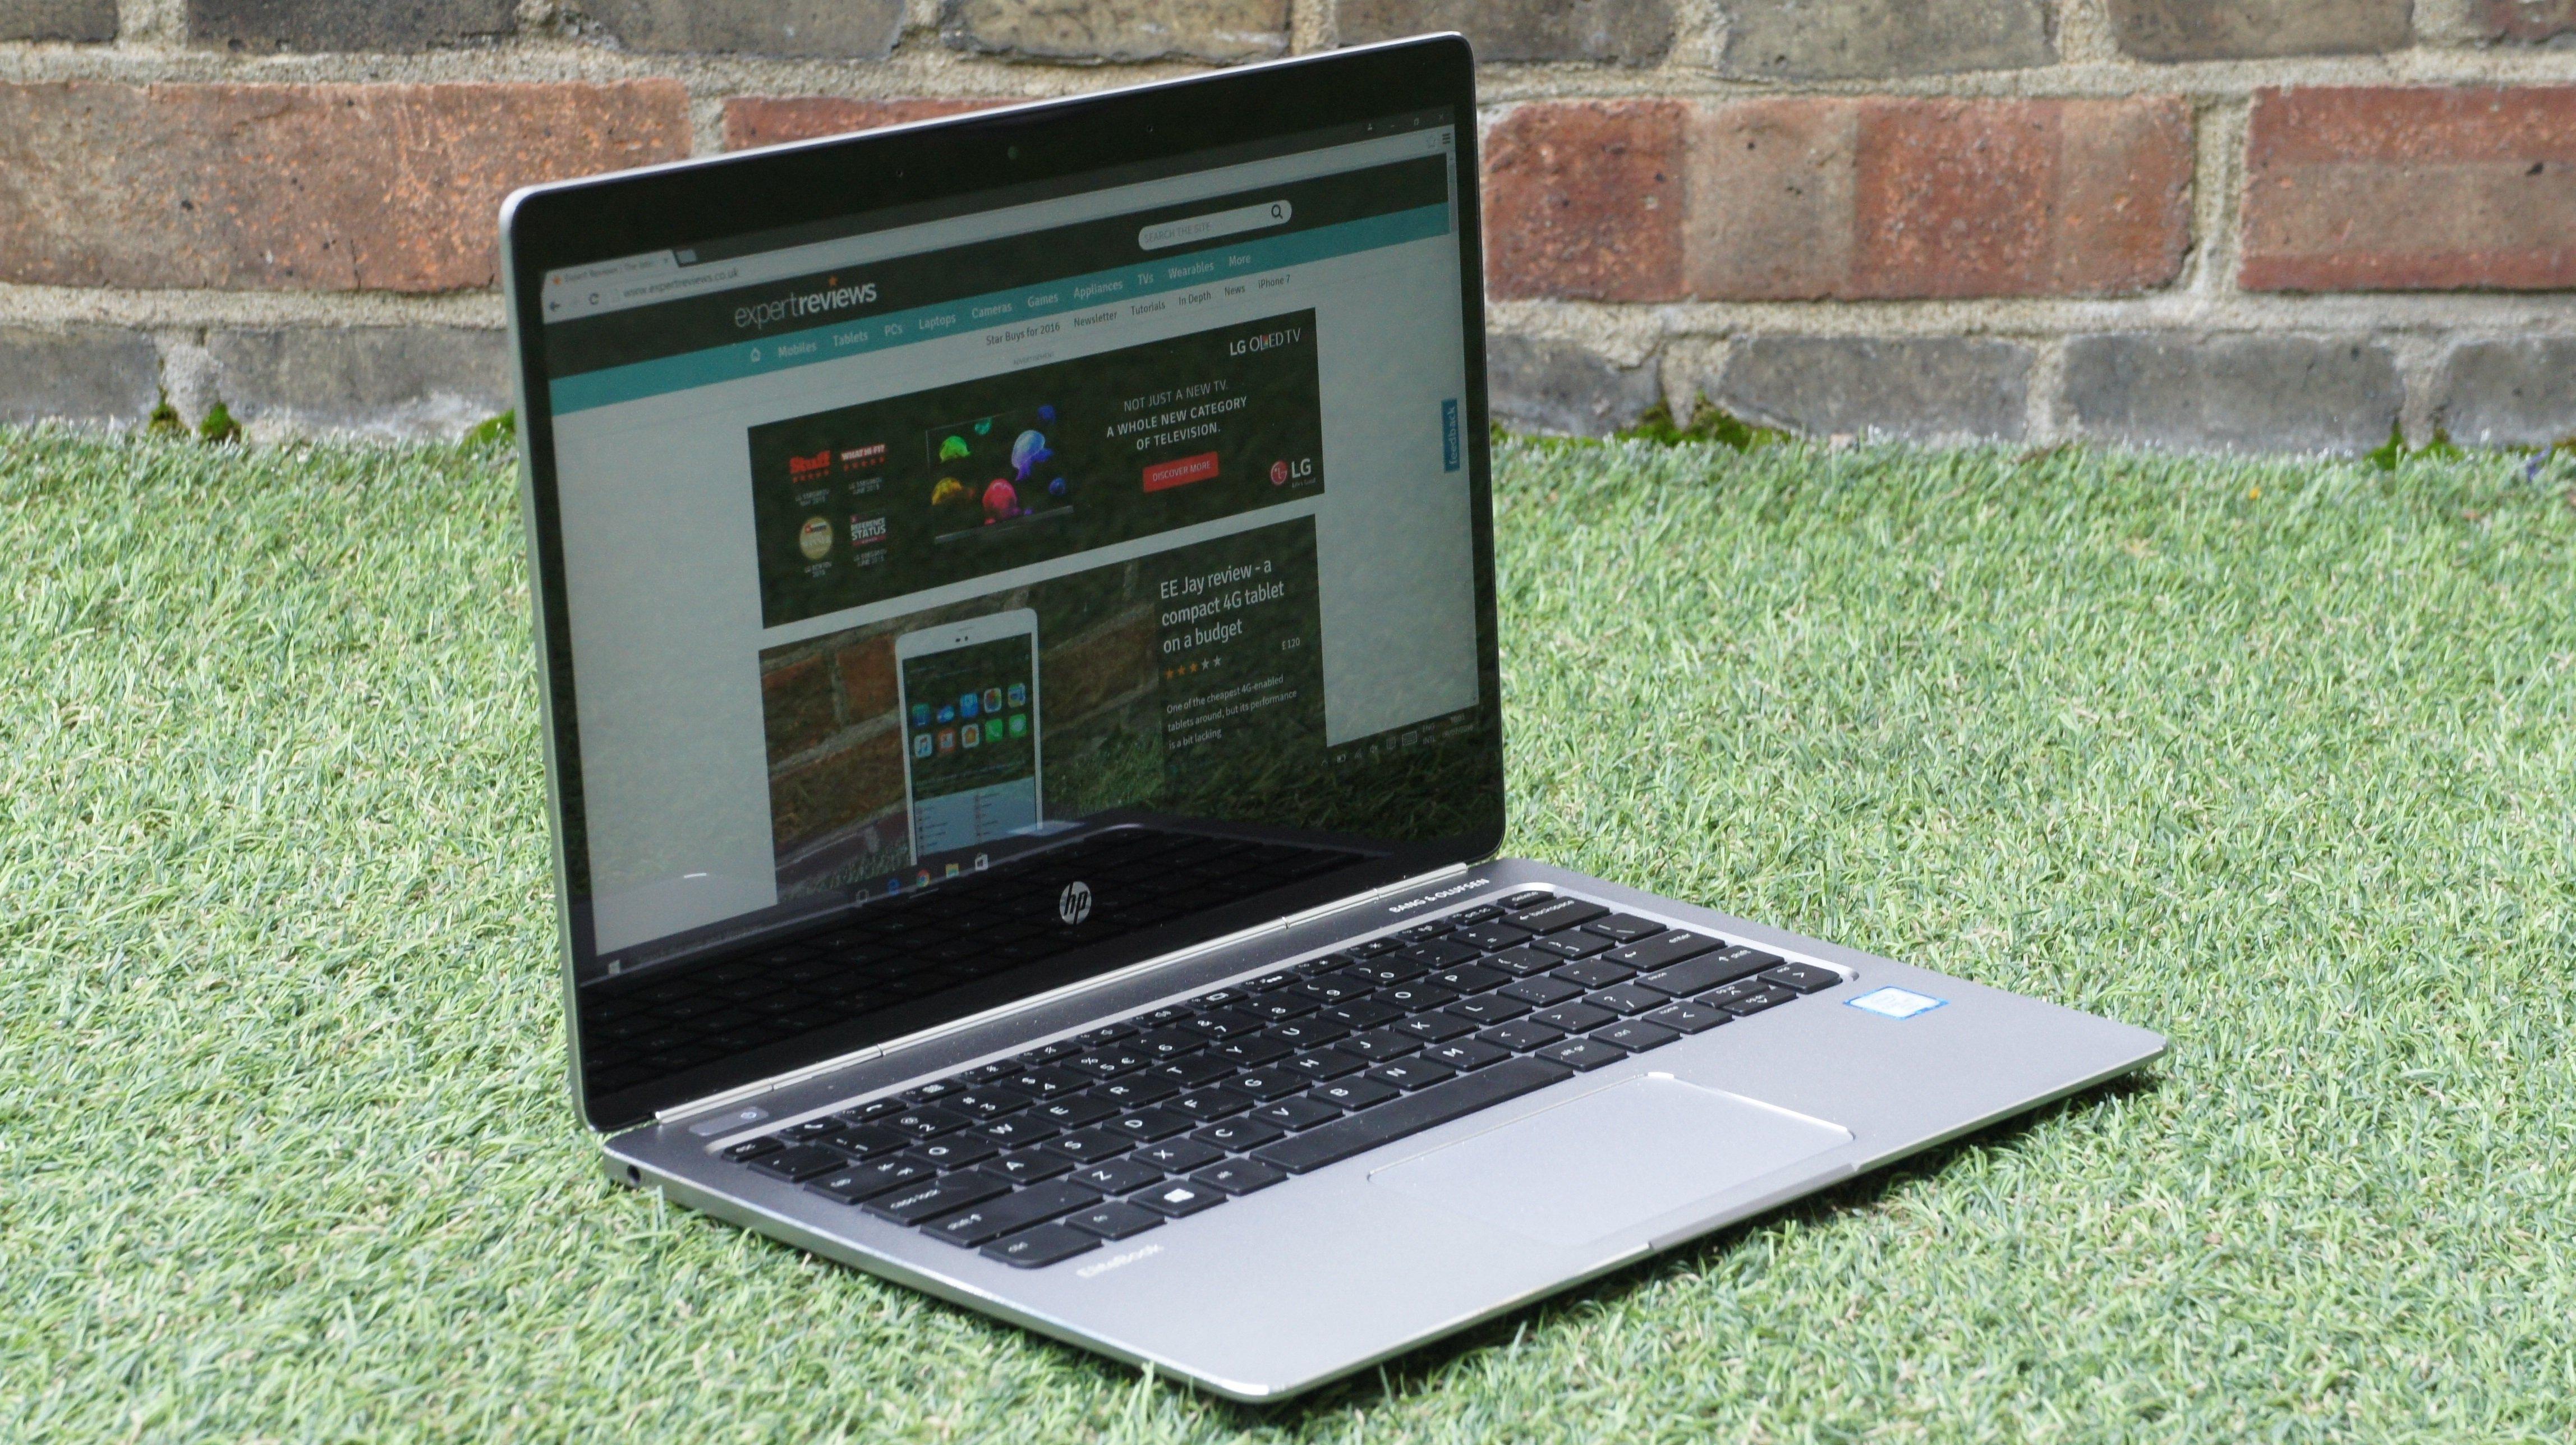 HP EliteBook Folio G1 review - the Windows 10 Macbook